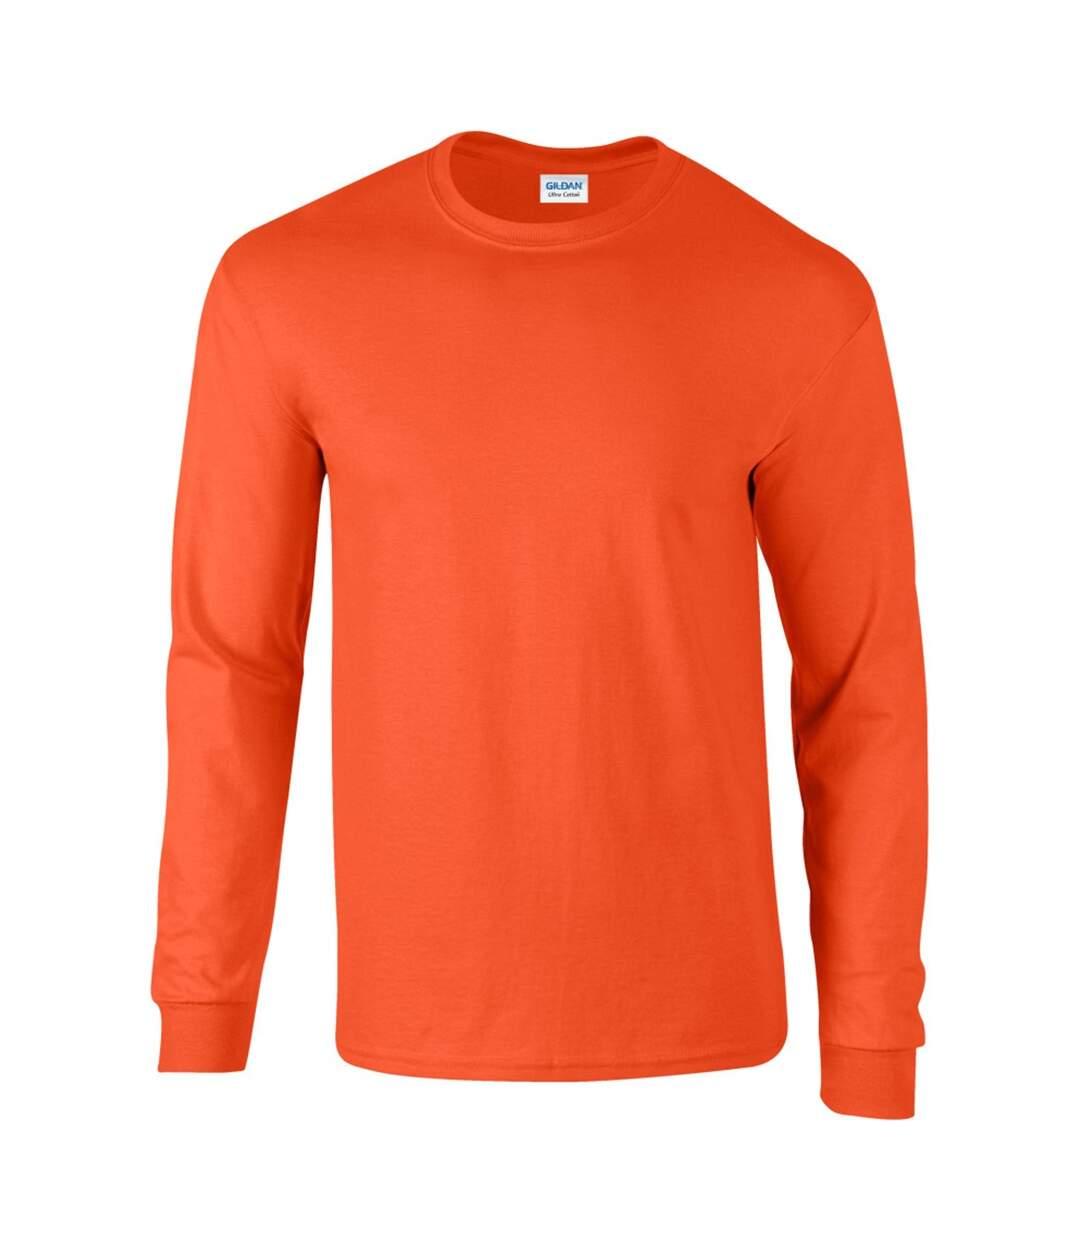 Gildan Mens Plain Crew Neck Ultra Cotton Long Sleeve T-Shirt (Orange) - UTBC477